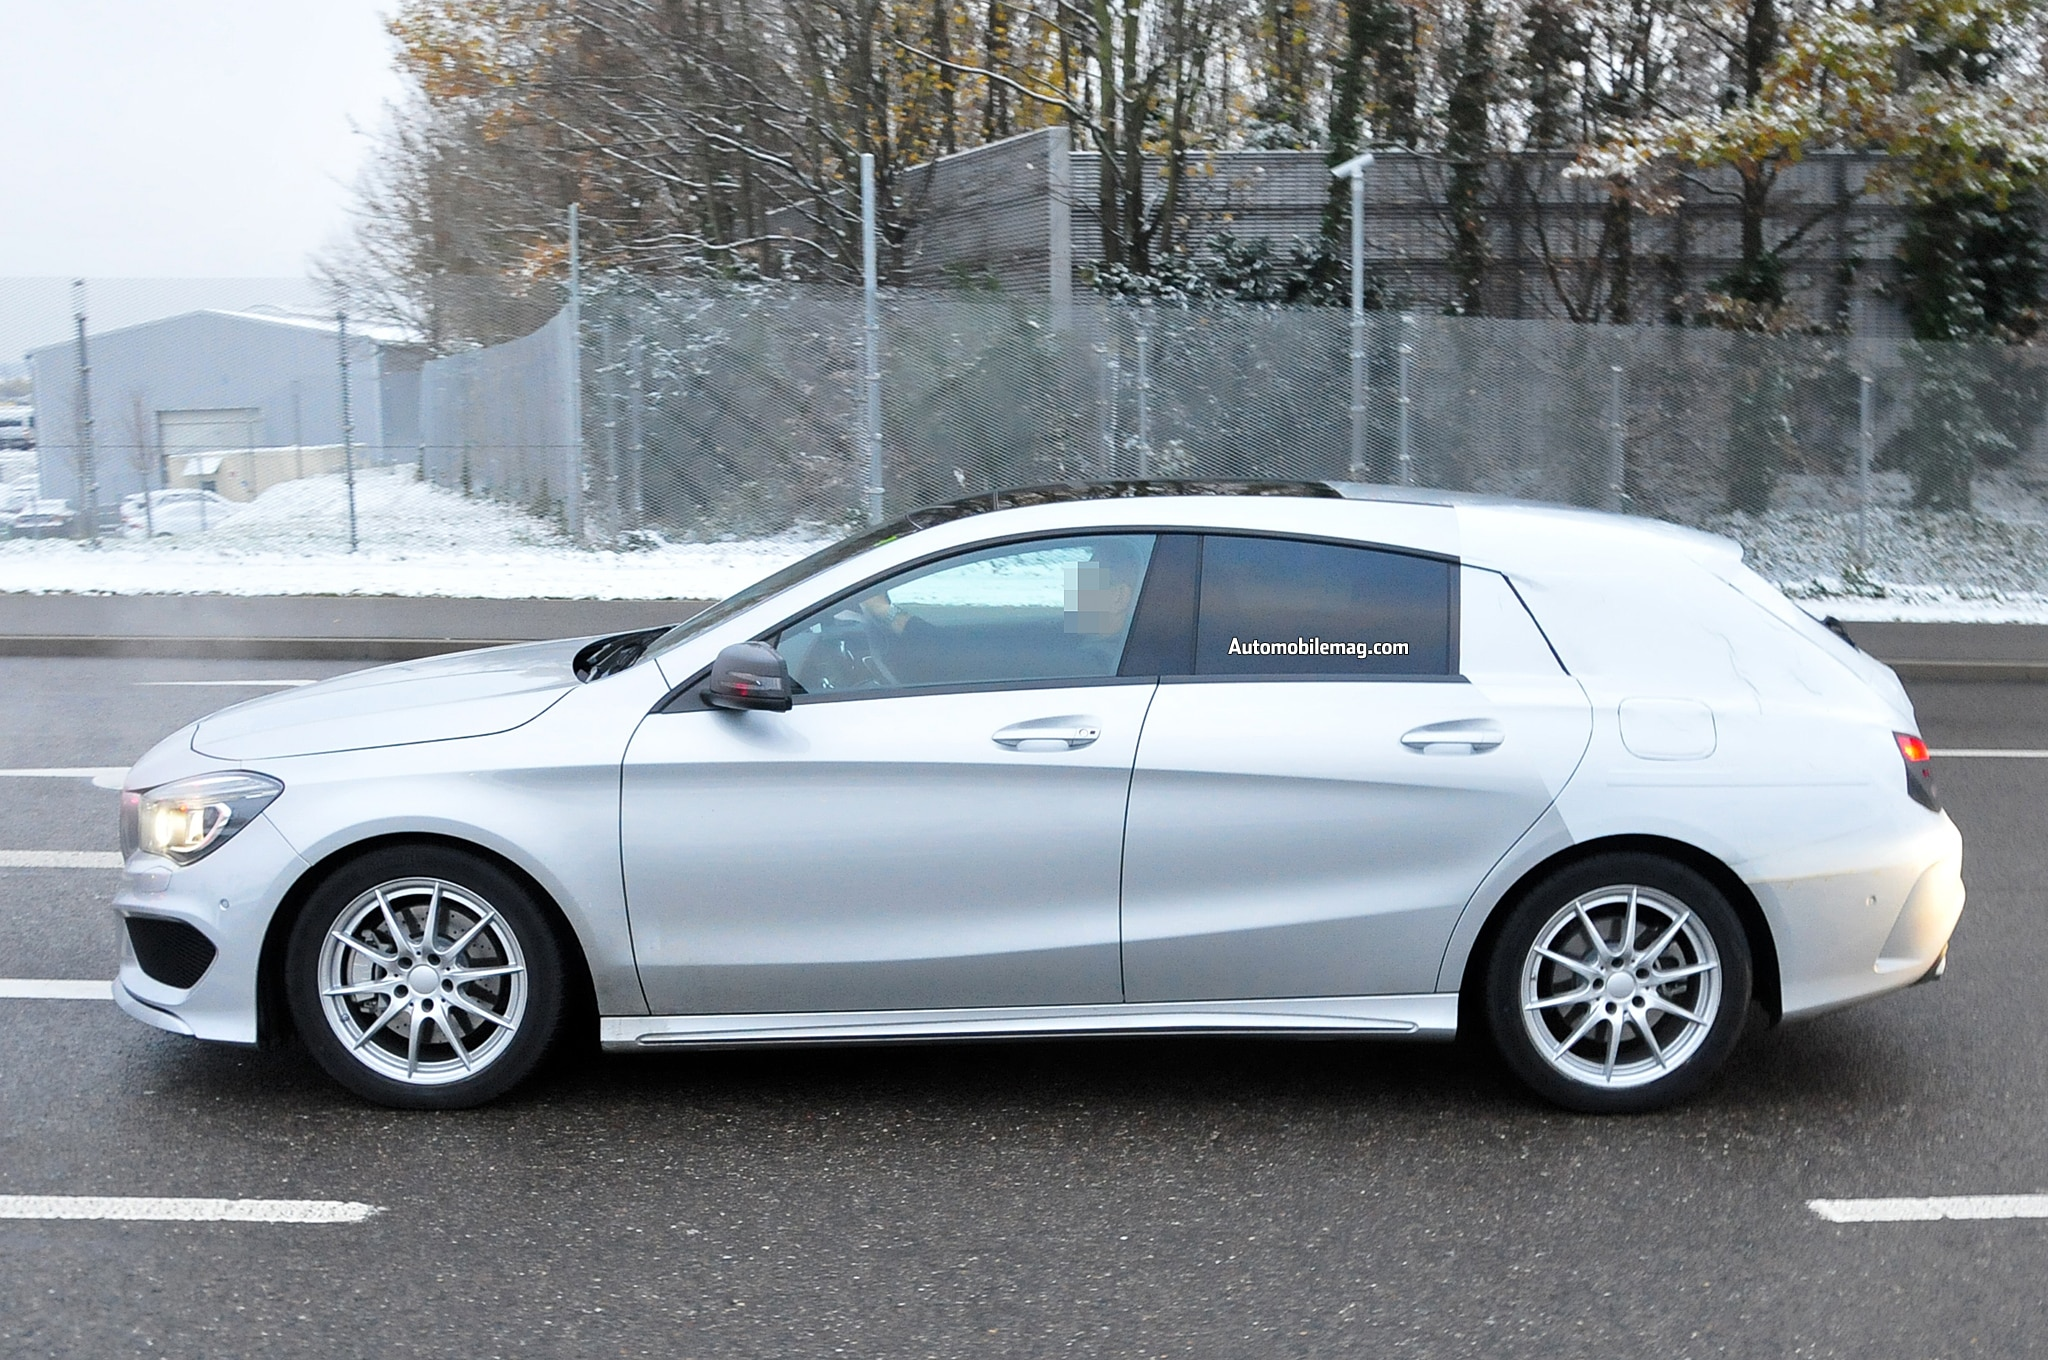 Mercedes Benz CLA Class Shooting Break Spied Profile 21